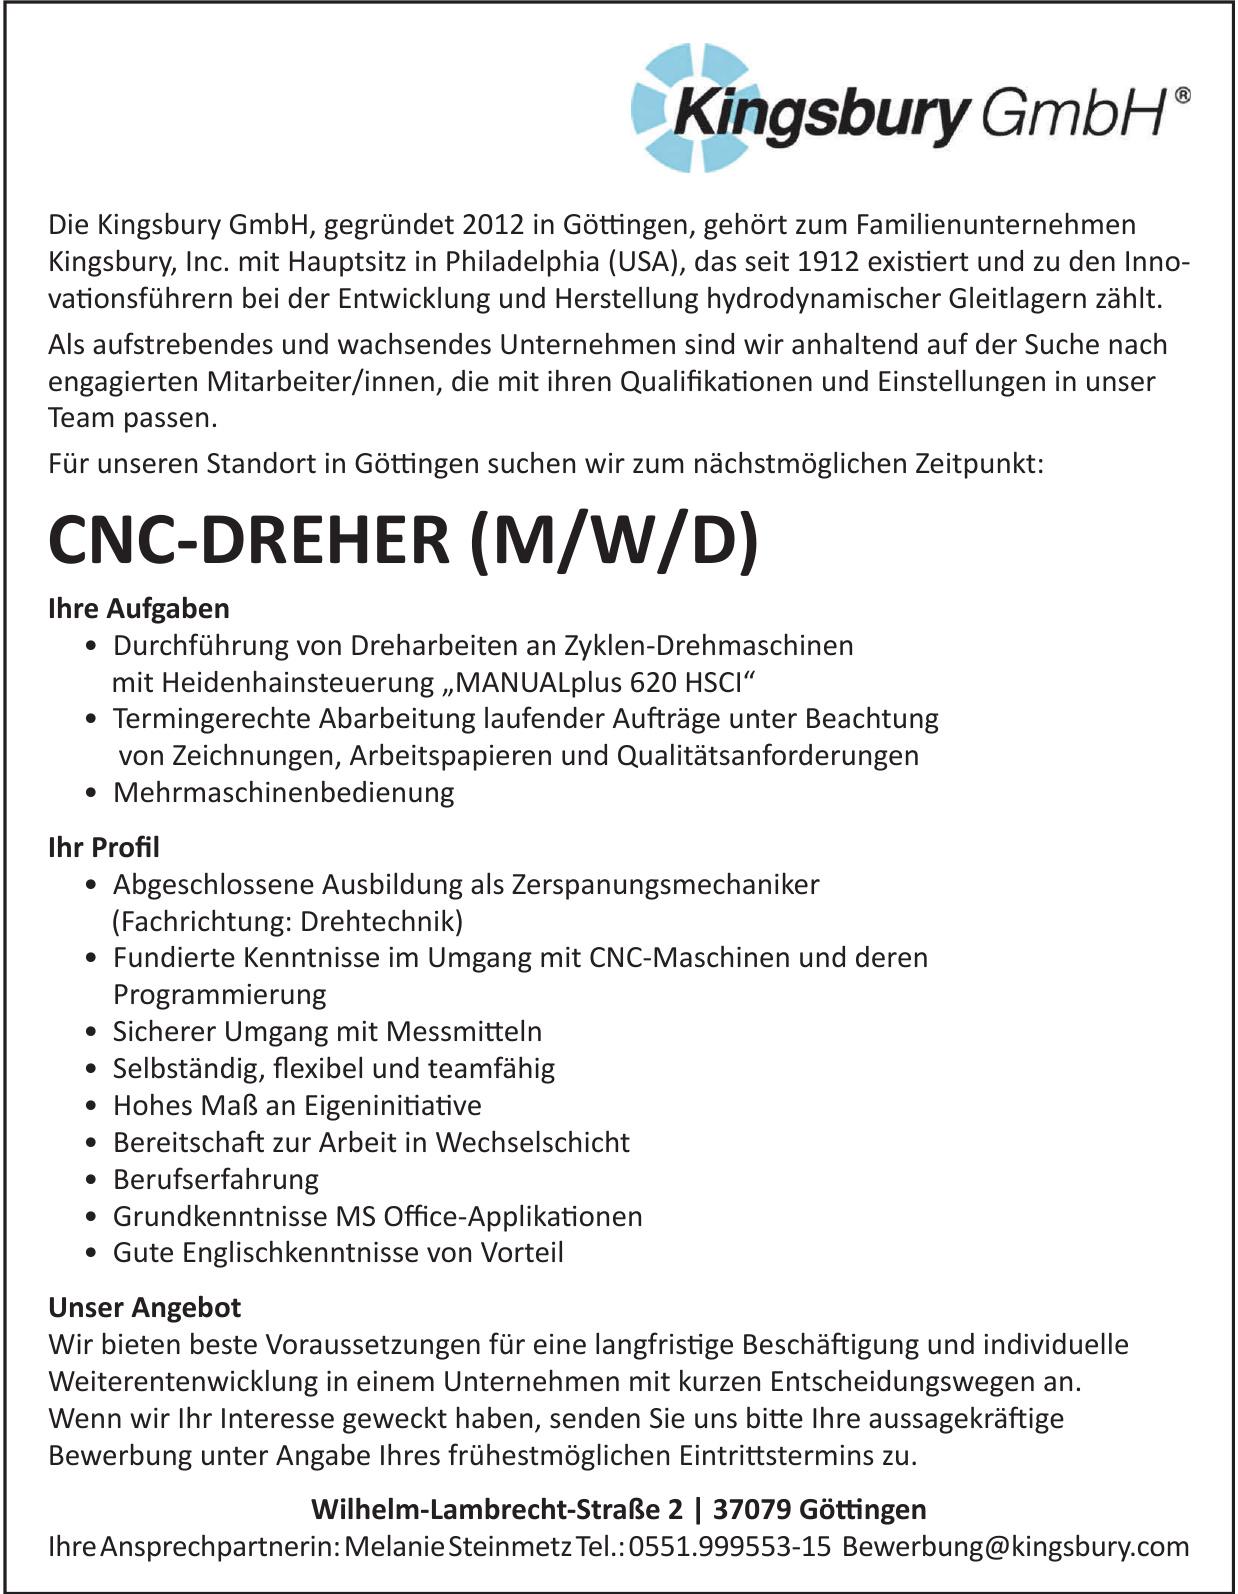 Kingsbury GmbH